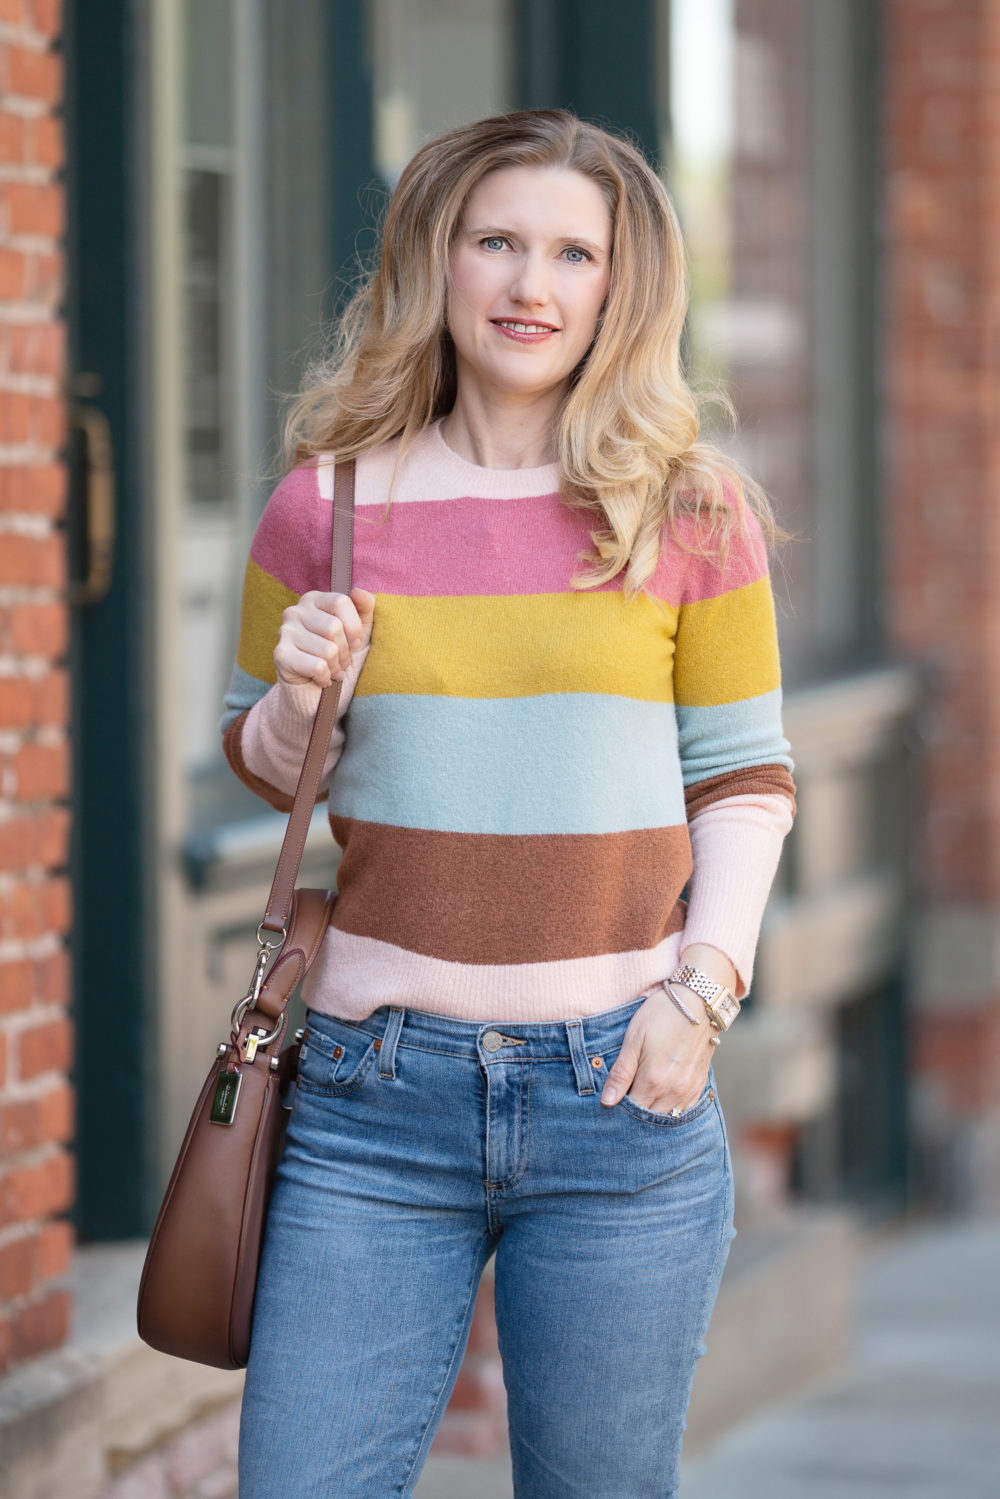 Petite Fashion Blog | Nordstrom Anniversary Sale | Halogen Crewneck Sweater | AG Prima Ankle Cigarette Jeans COACH Nomad Burnished Leather Crossbody Bag